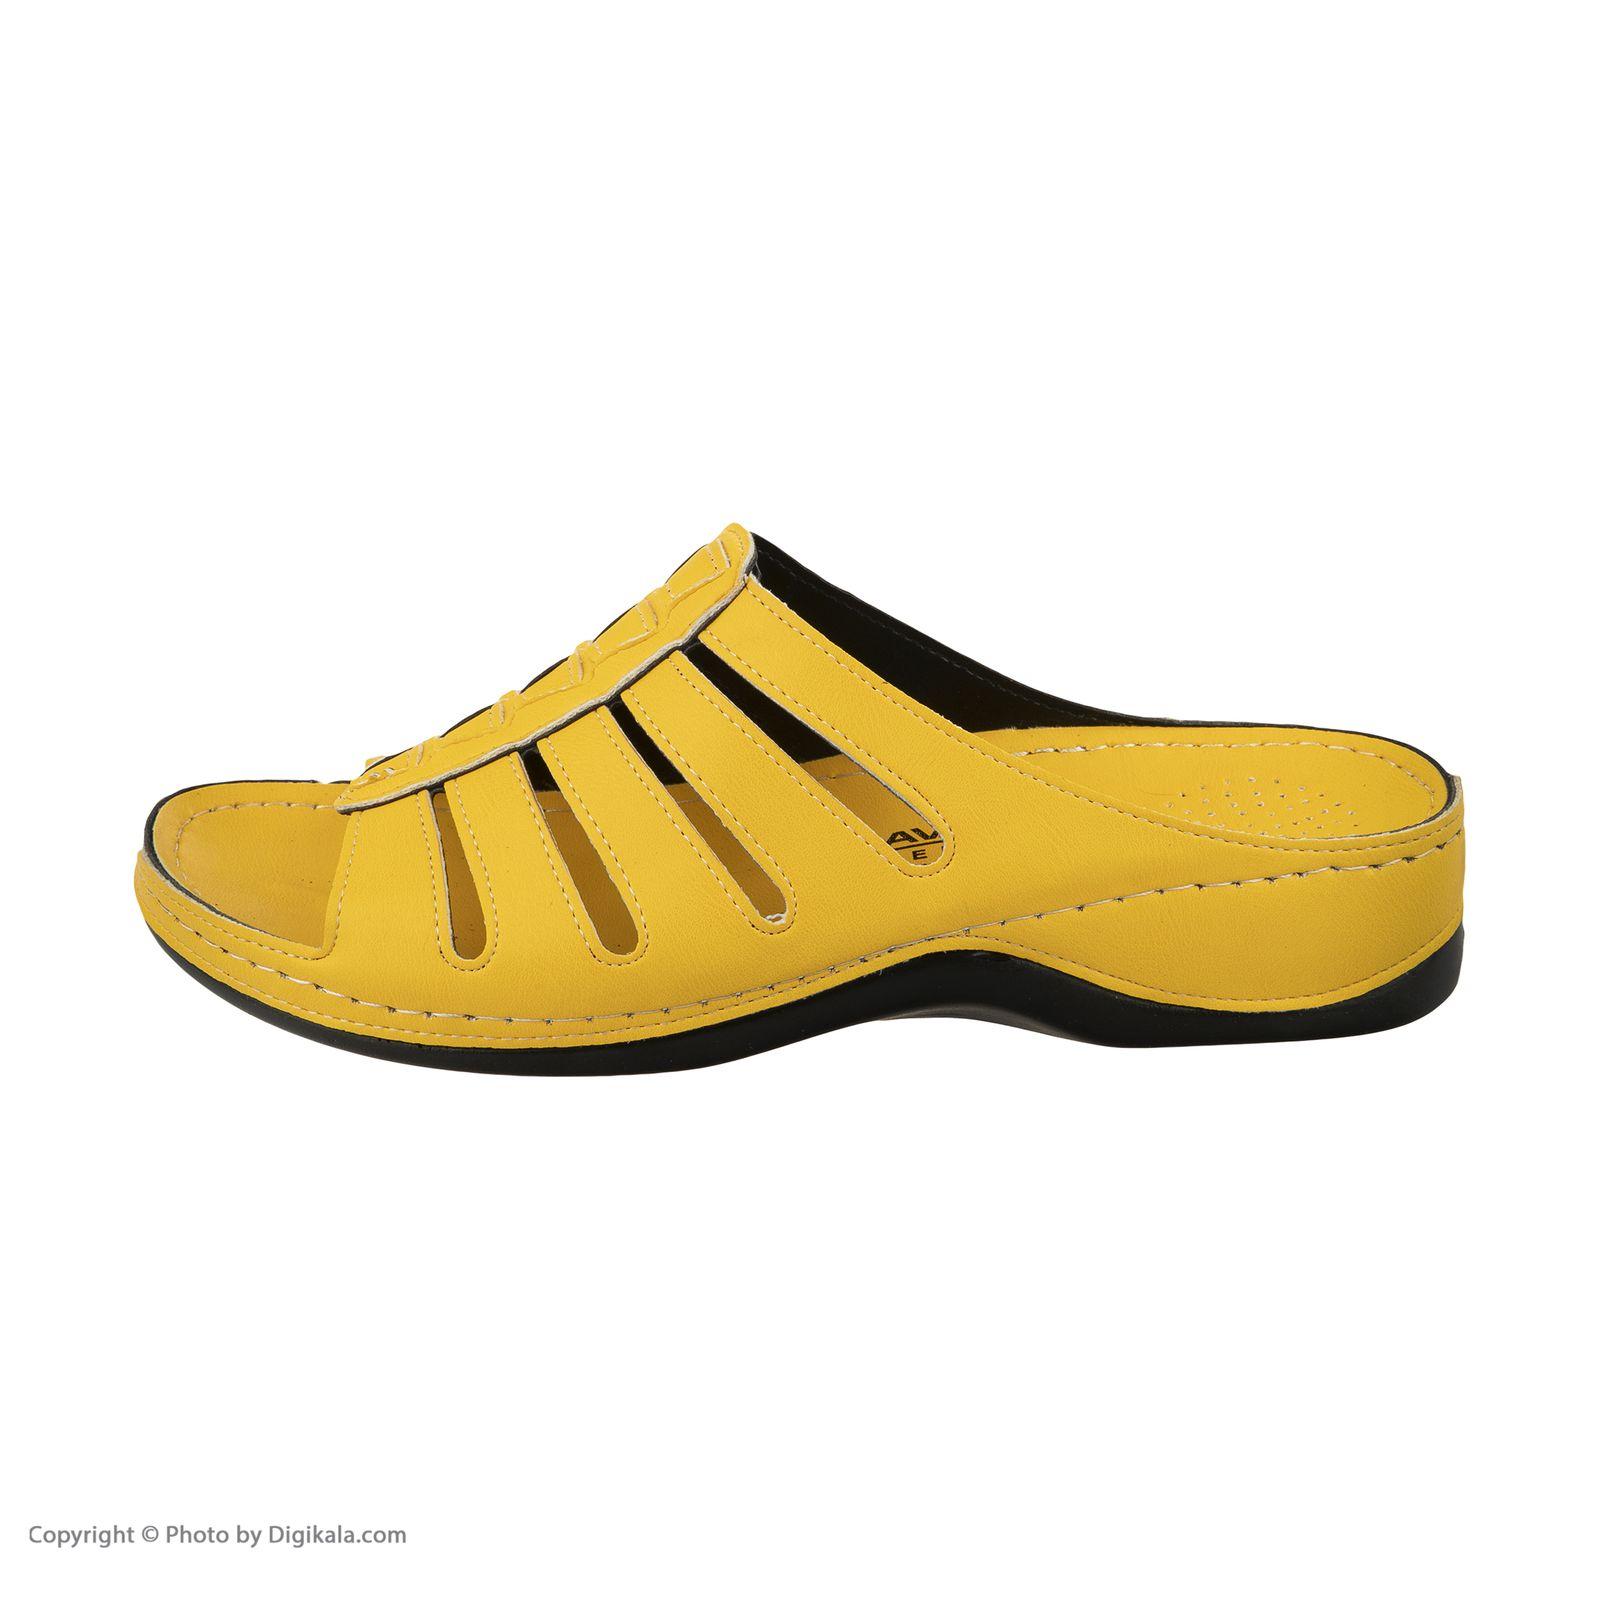 دمپایی زنانه آویده کد av-0304216 رنگ زرد -  - 6